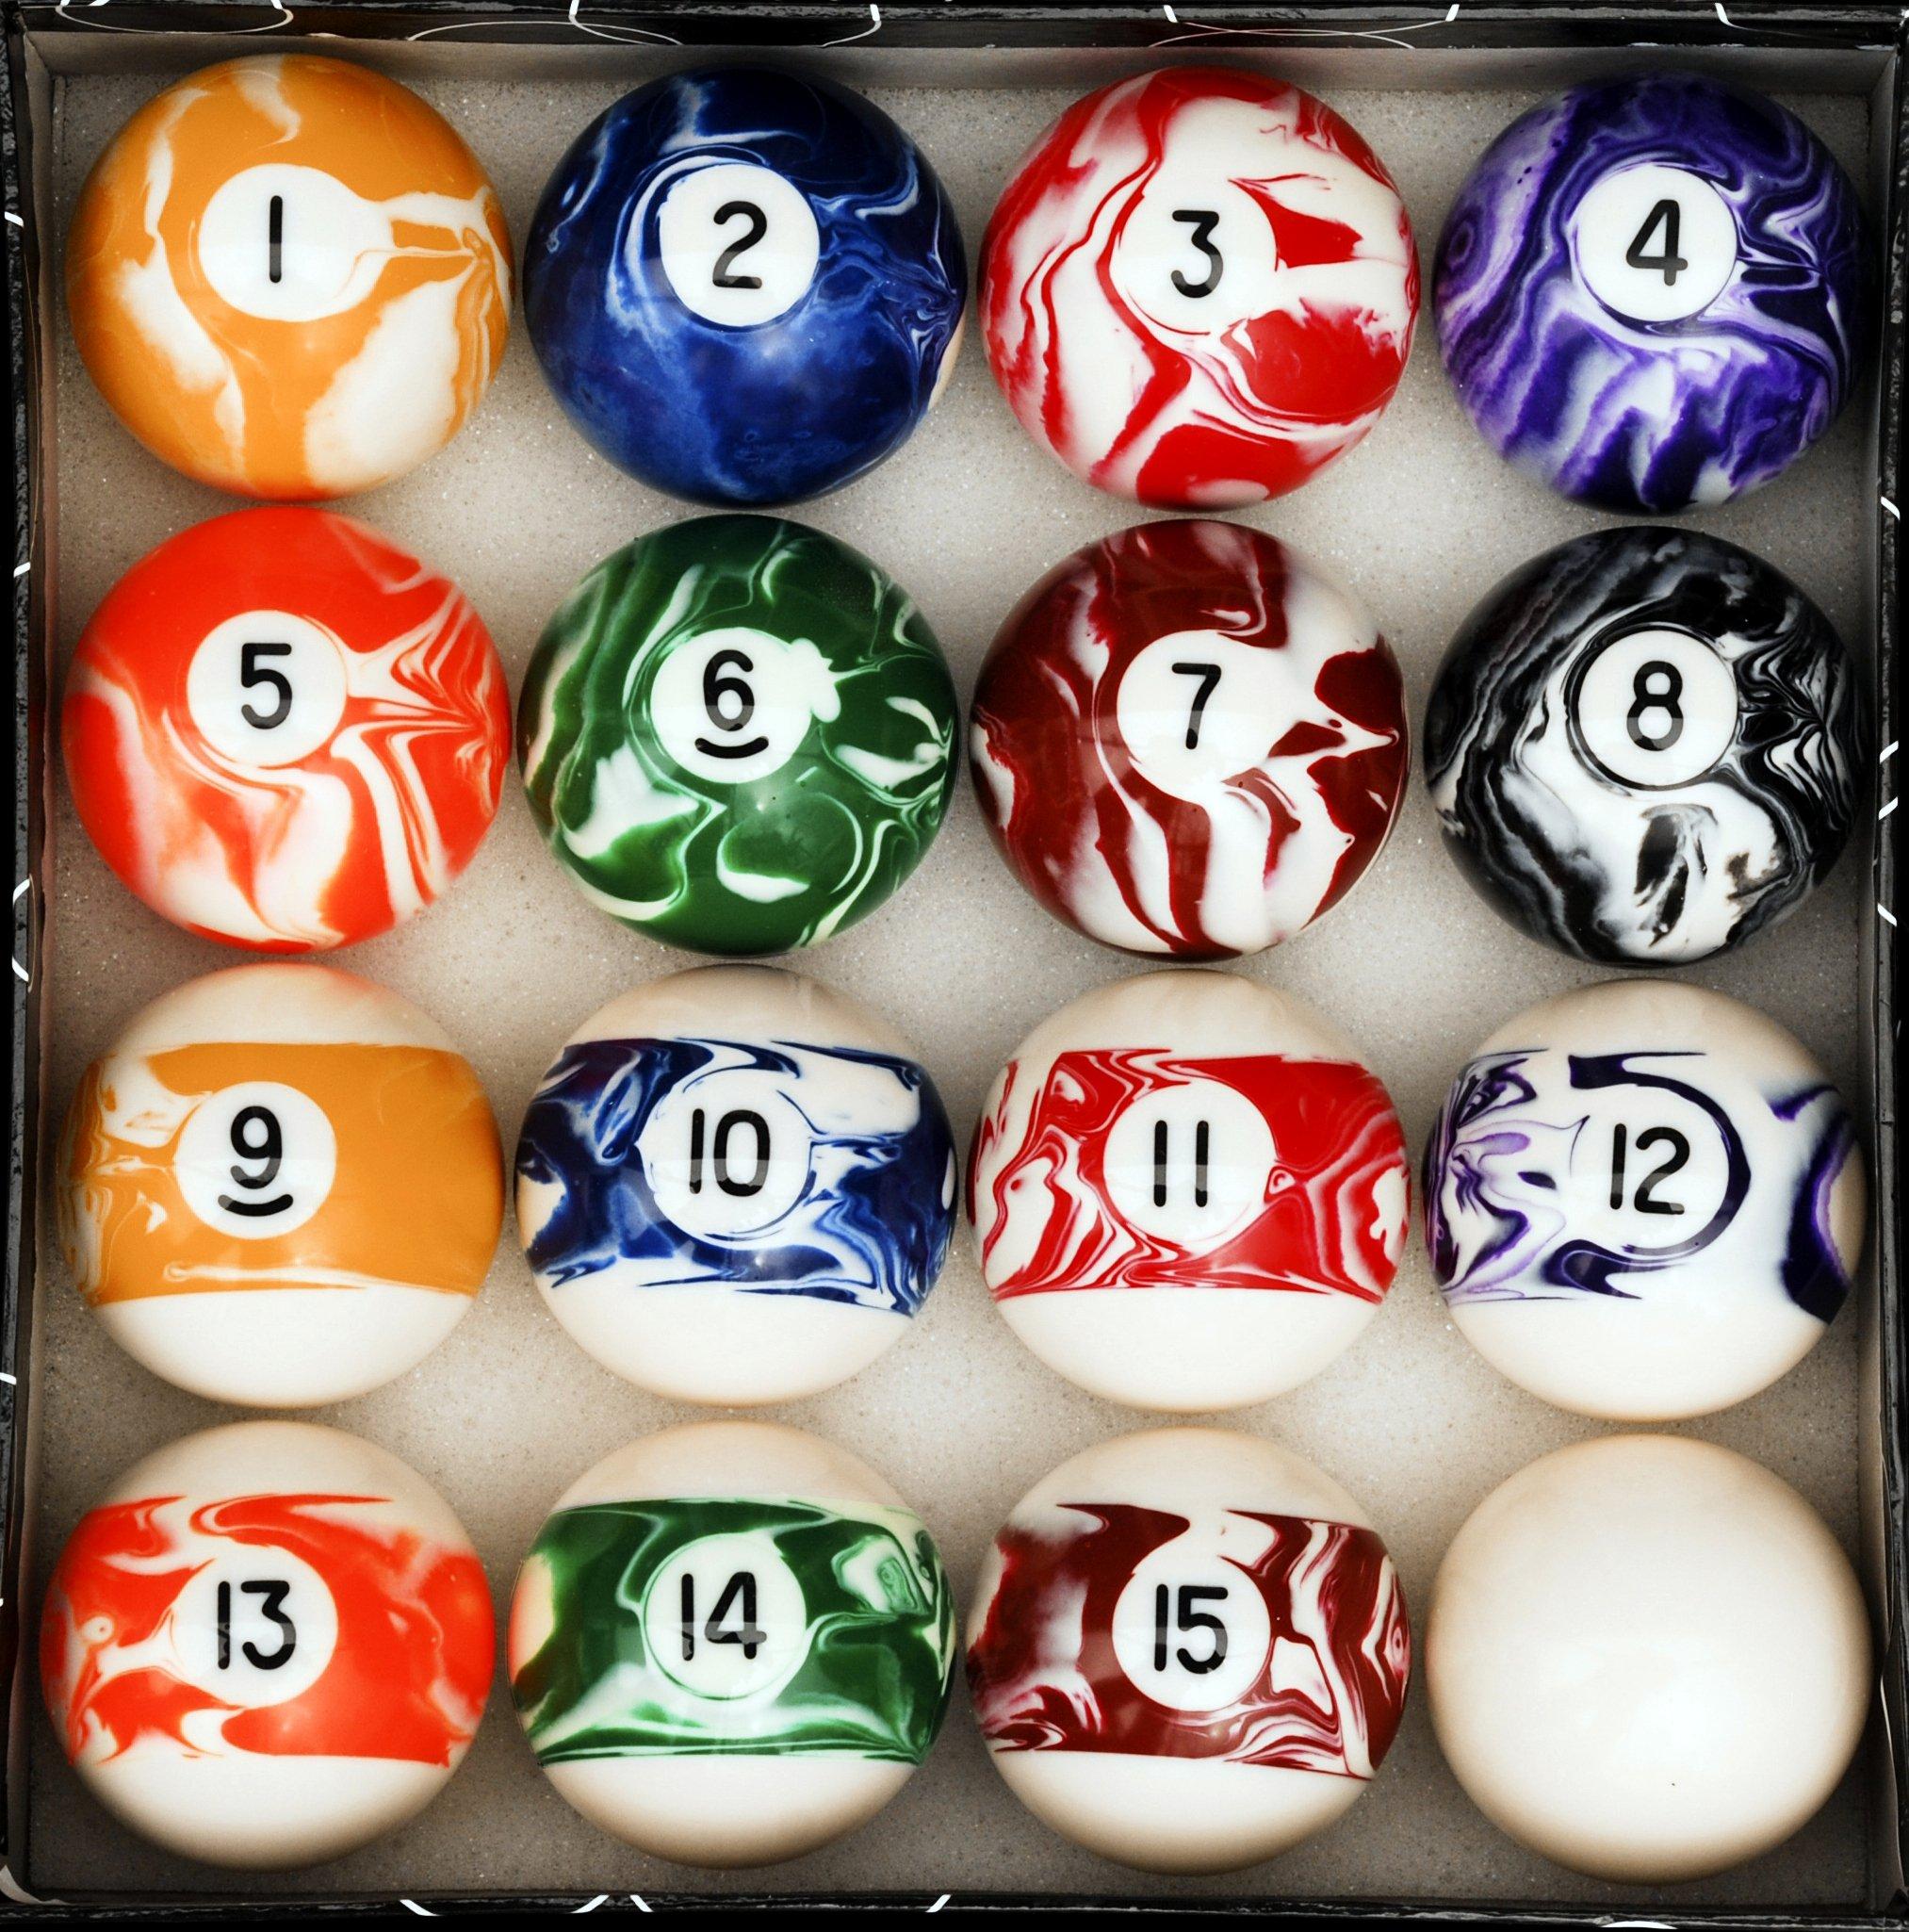 Iszy Billiards Pool Table Billiard Ball Set, Marble/Swirl Style by Iszy Billiards